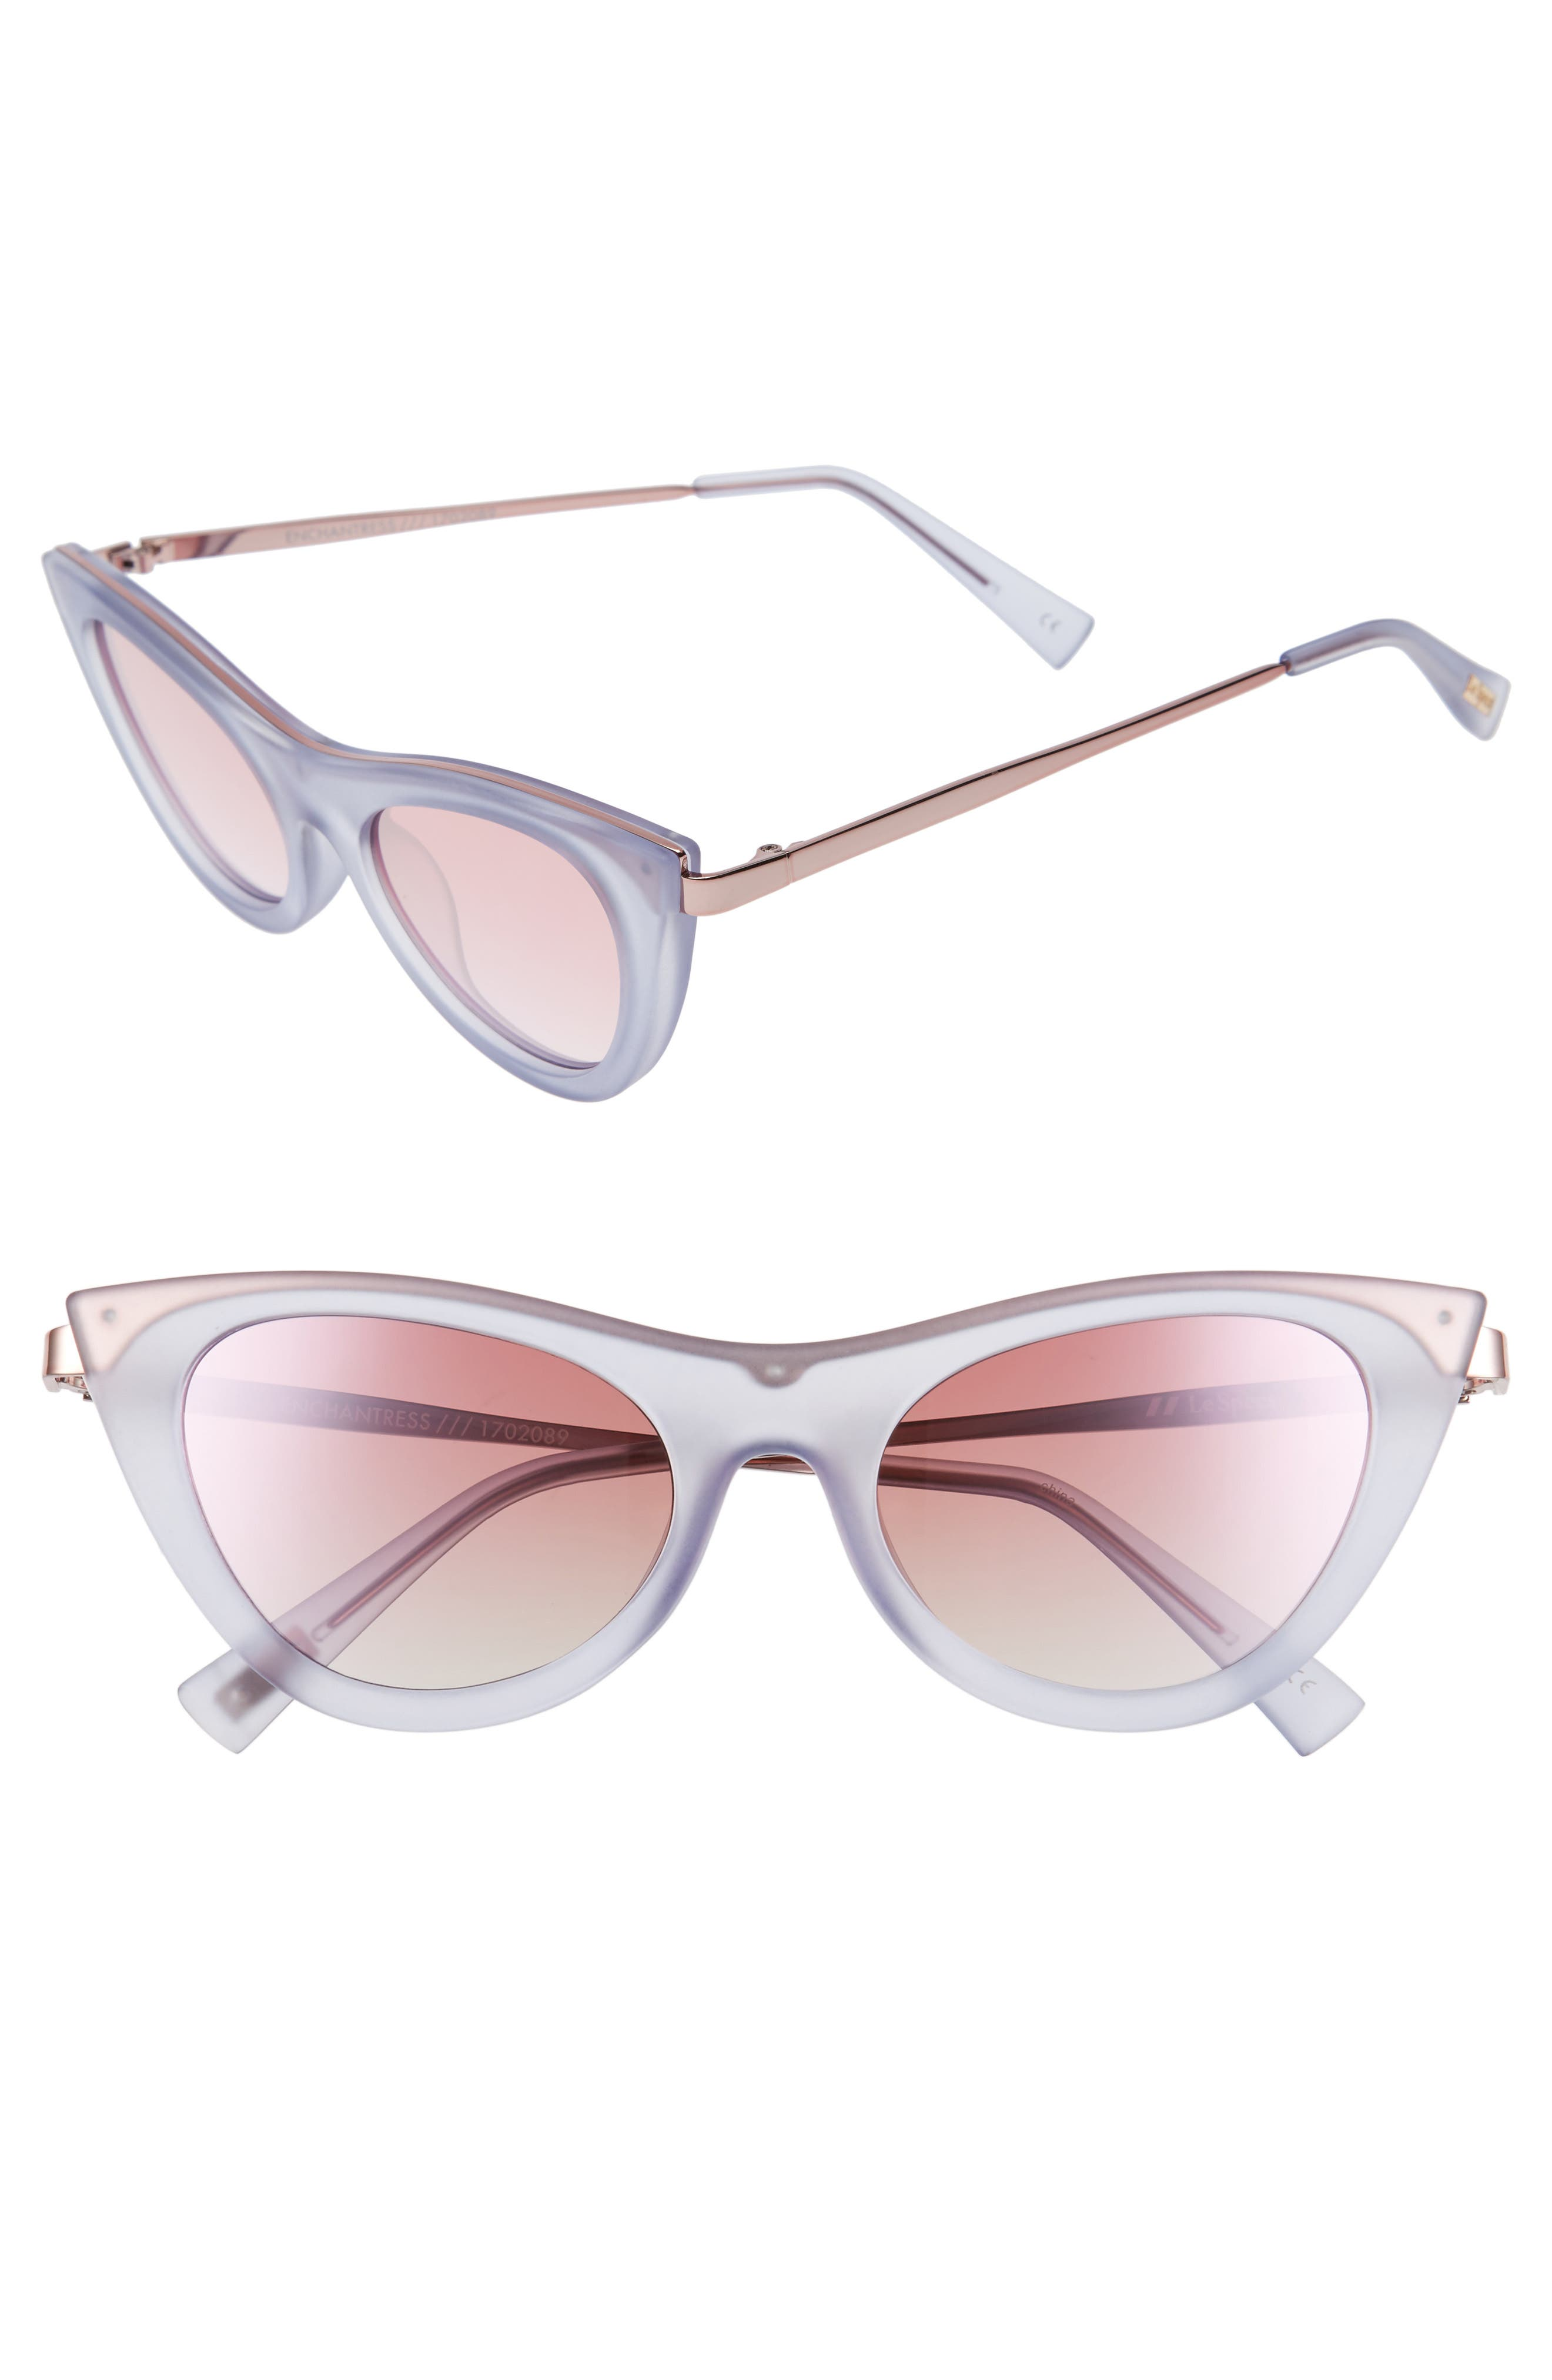 Main Image - Le Specs Enchantress 49mm Retro Sunglasses